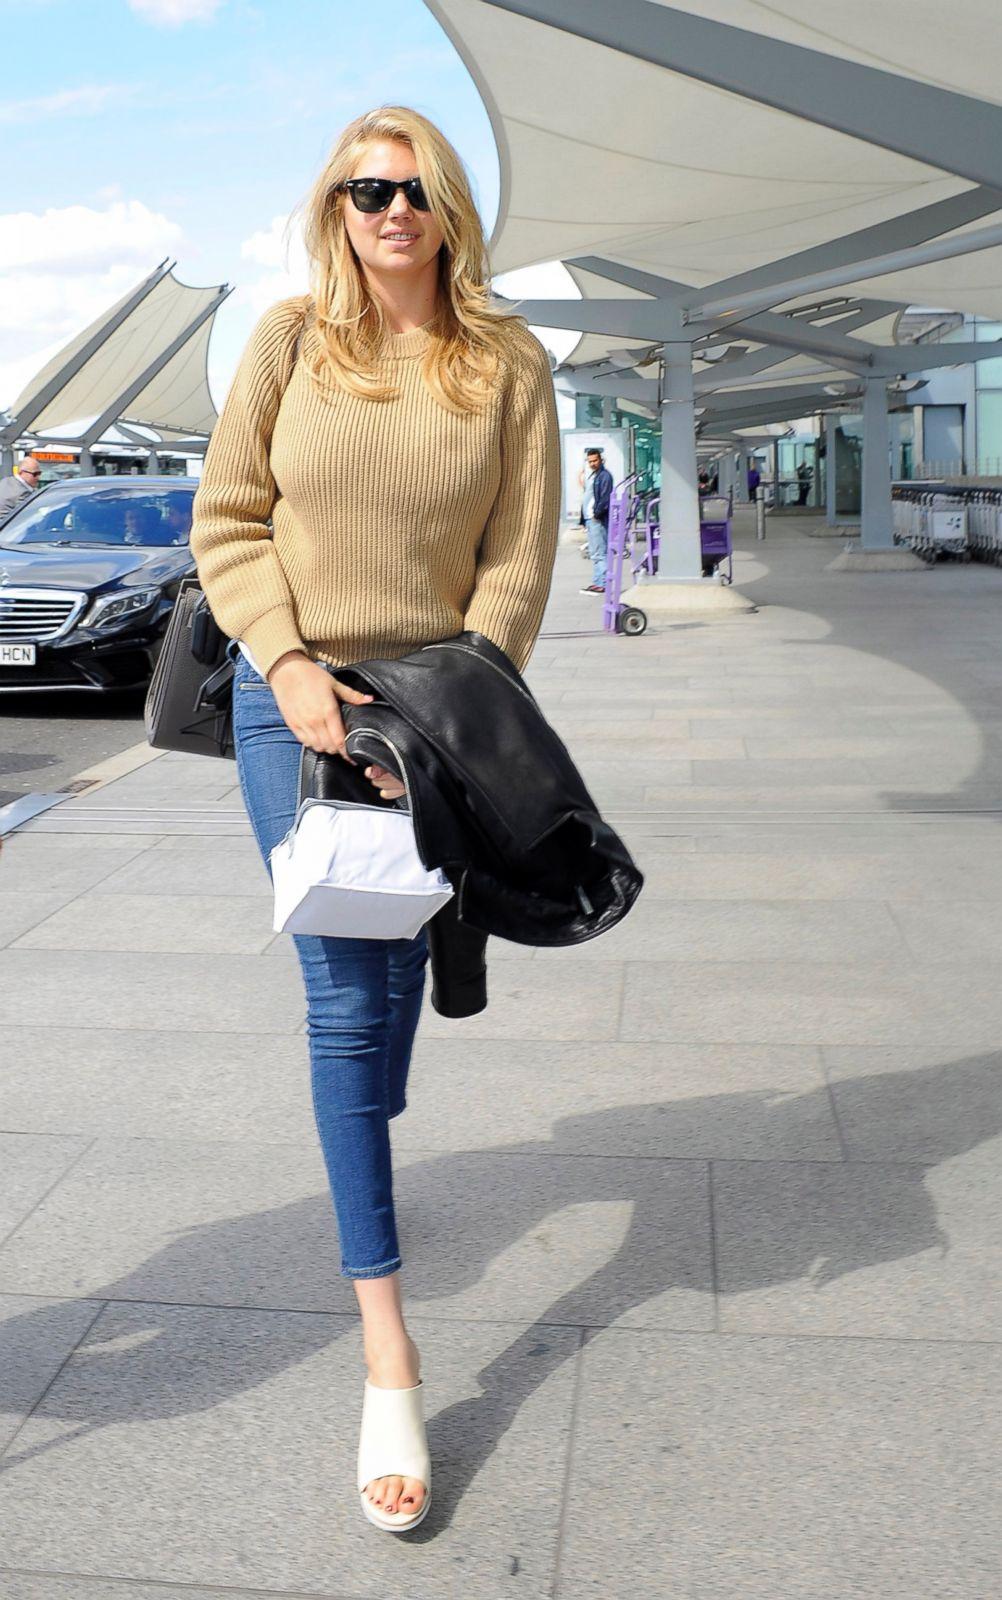 Kate Upton Goes Makeup Free Picture Celebrities Without Makeup - Kate-upton-no-makeup